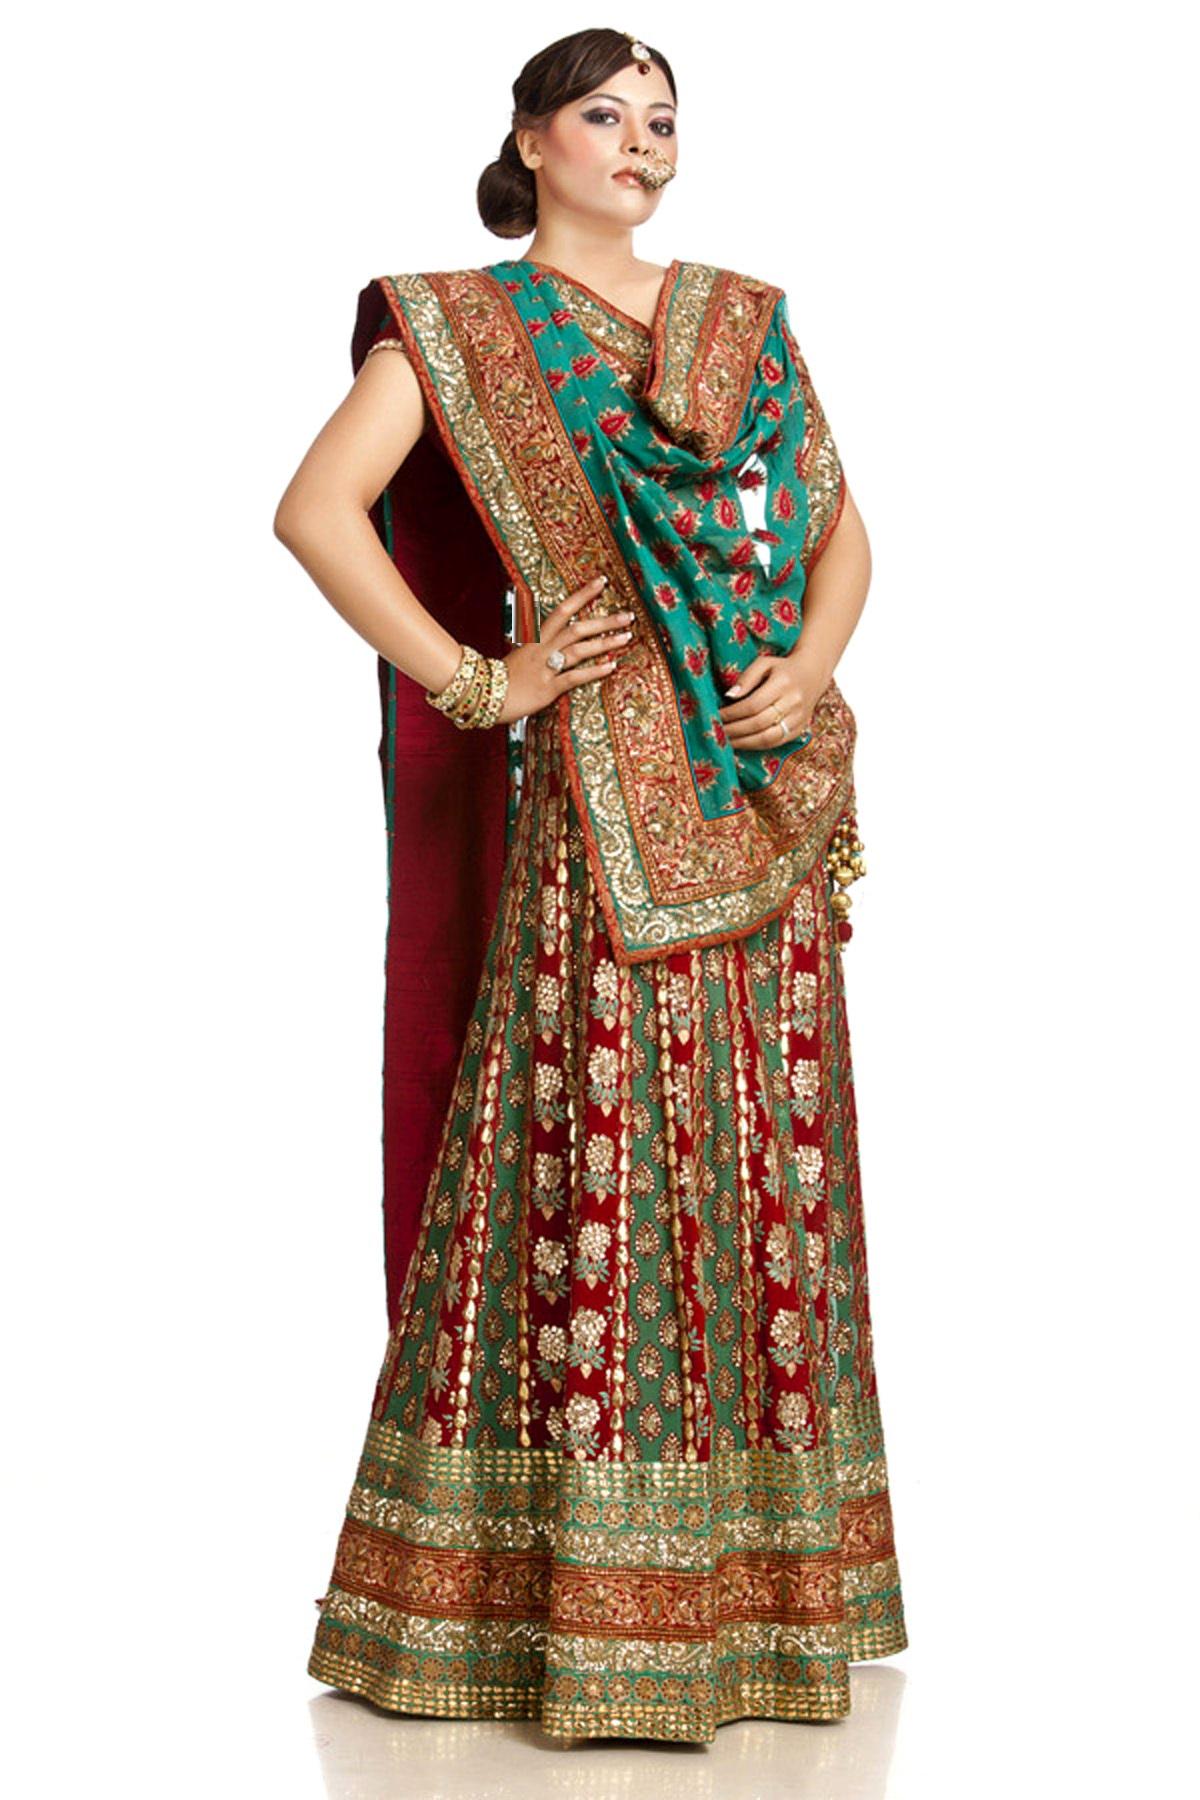 Indian-Bridal-Lehenga-Choli-Designs (6)